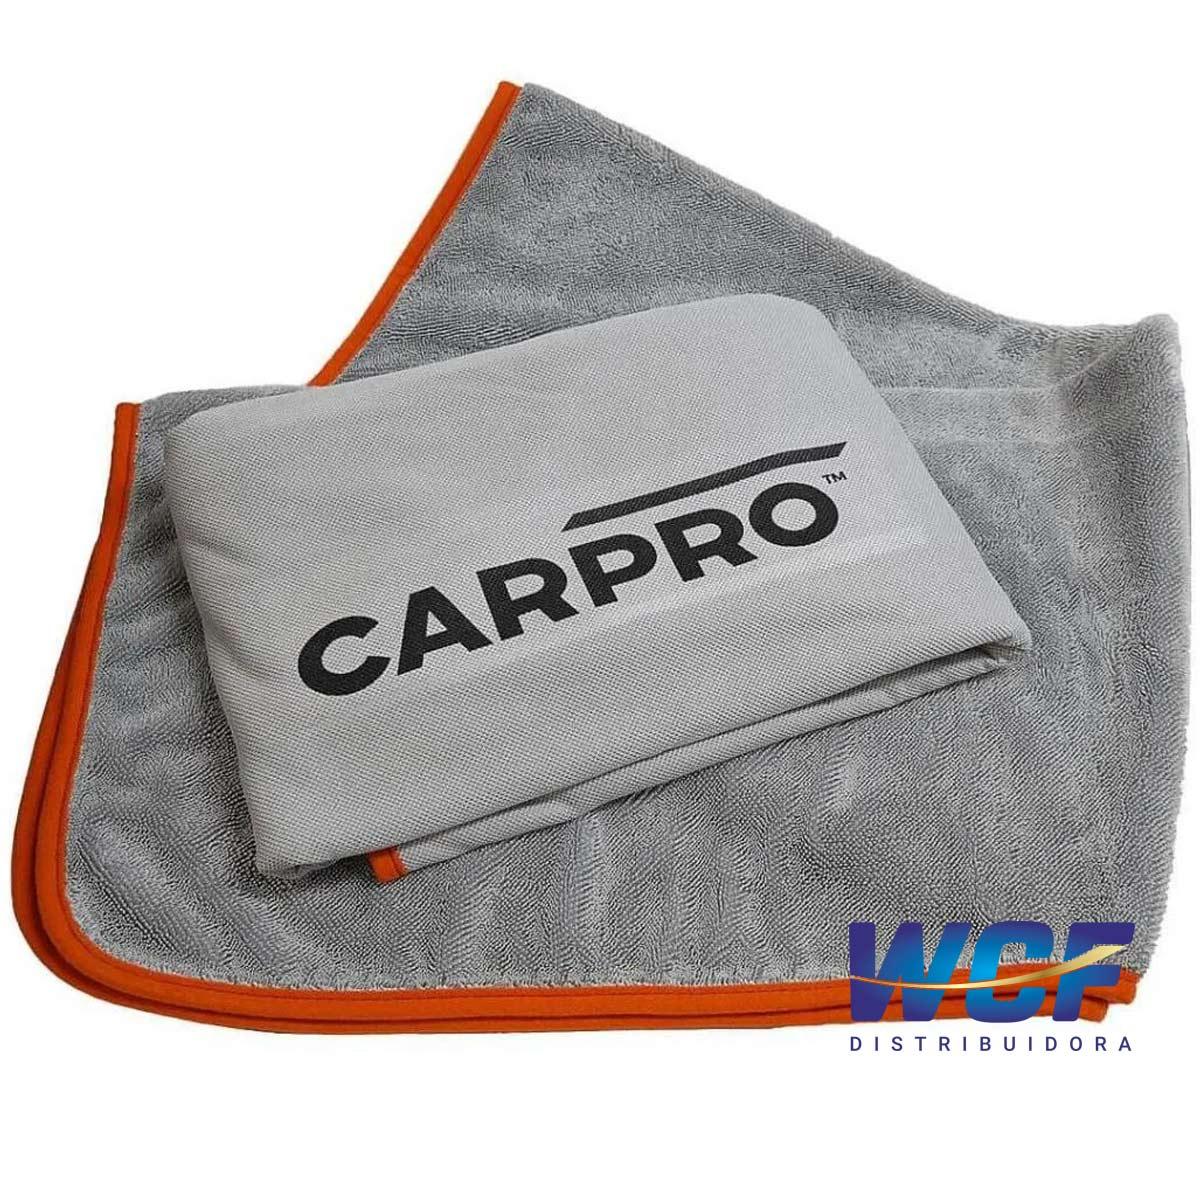 CARPRO DHYDRATE 70X100 TOALHA SECAGEM GRANDE